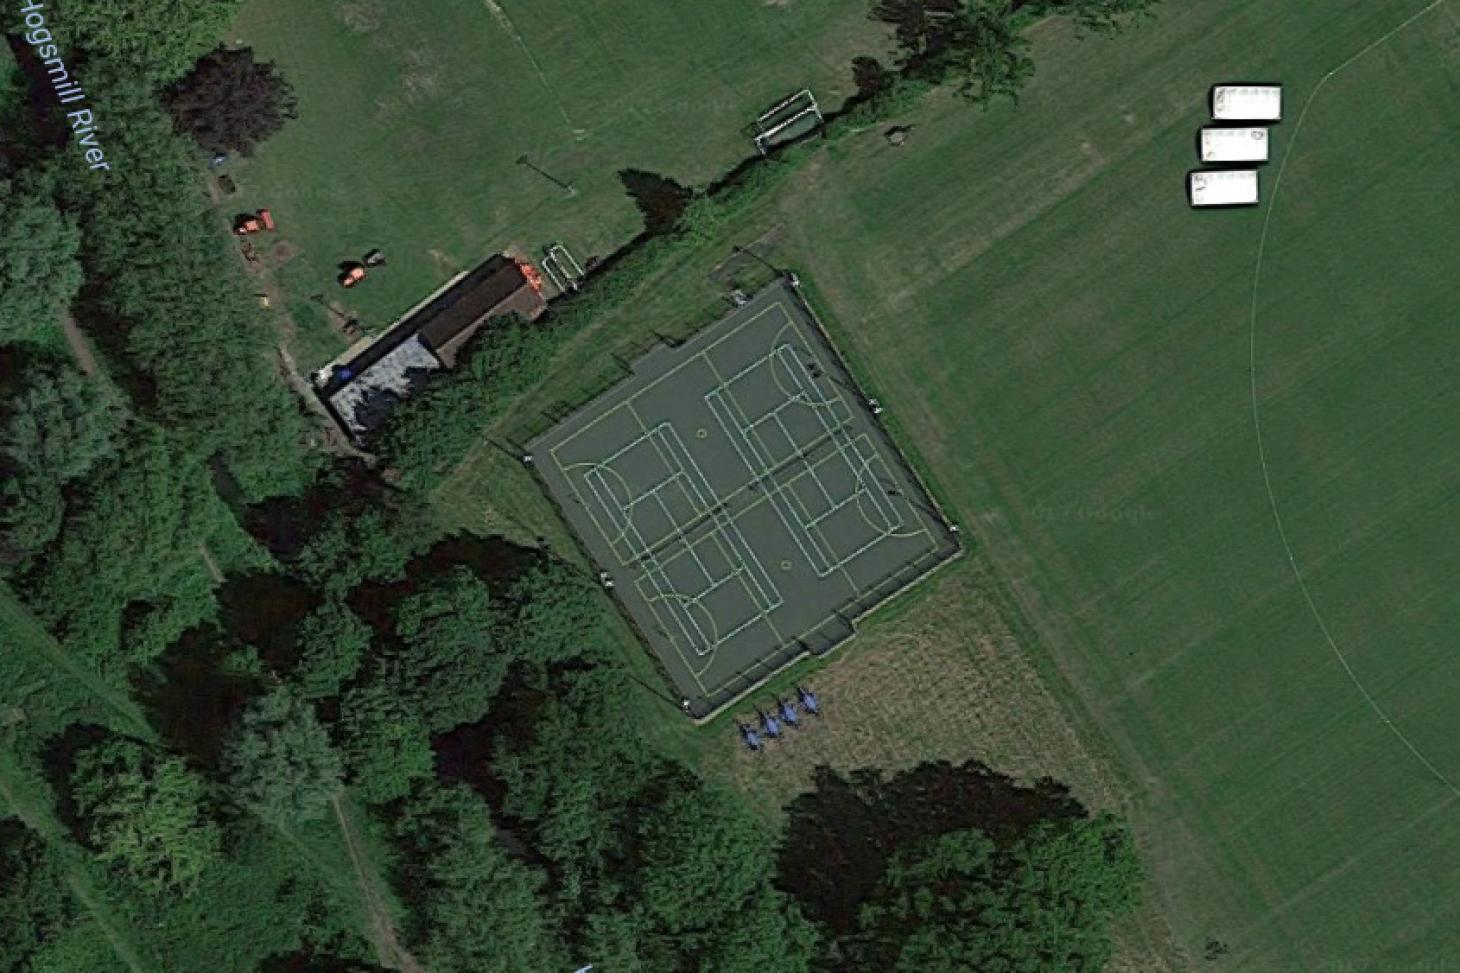 King's College Sports Ground - New Malden Outdoor | Concrete netball court